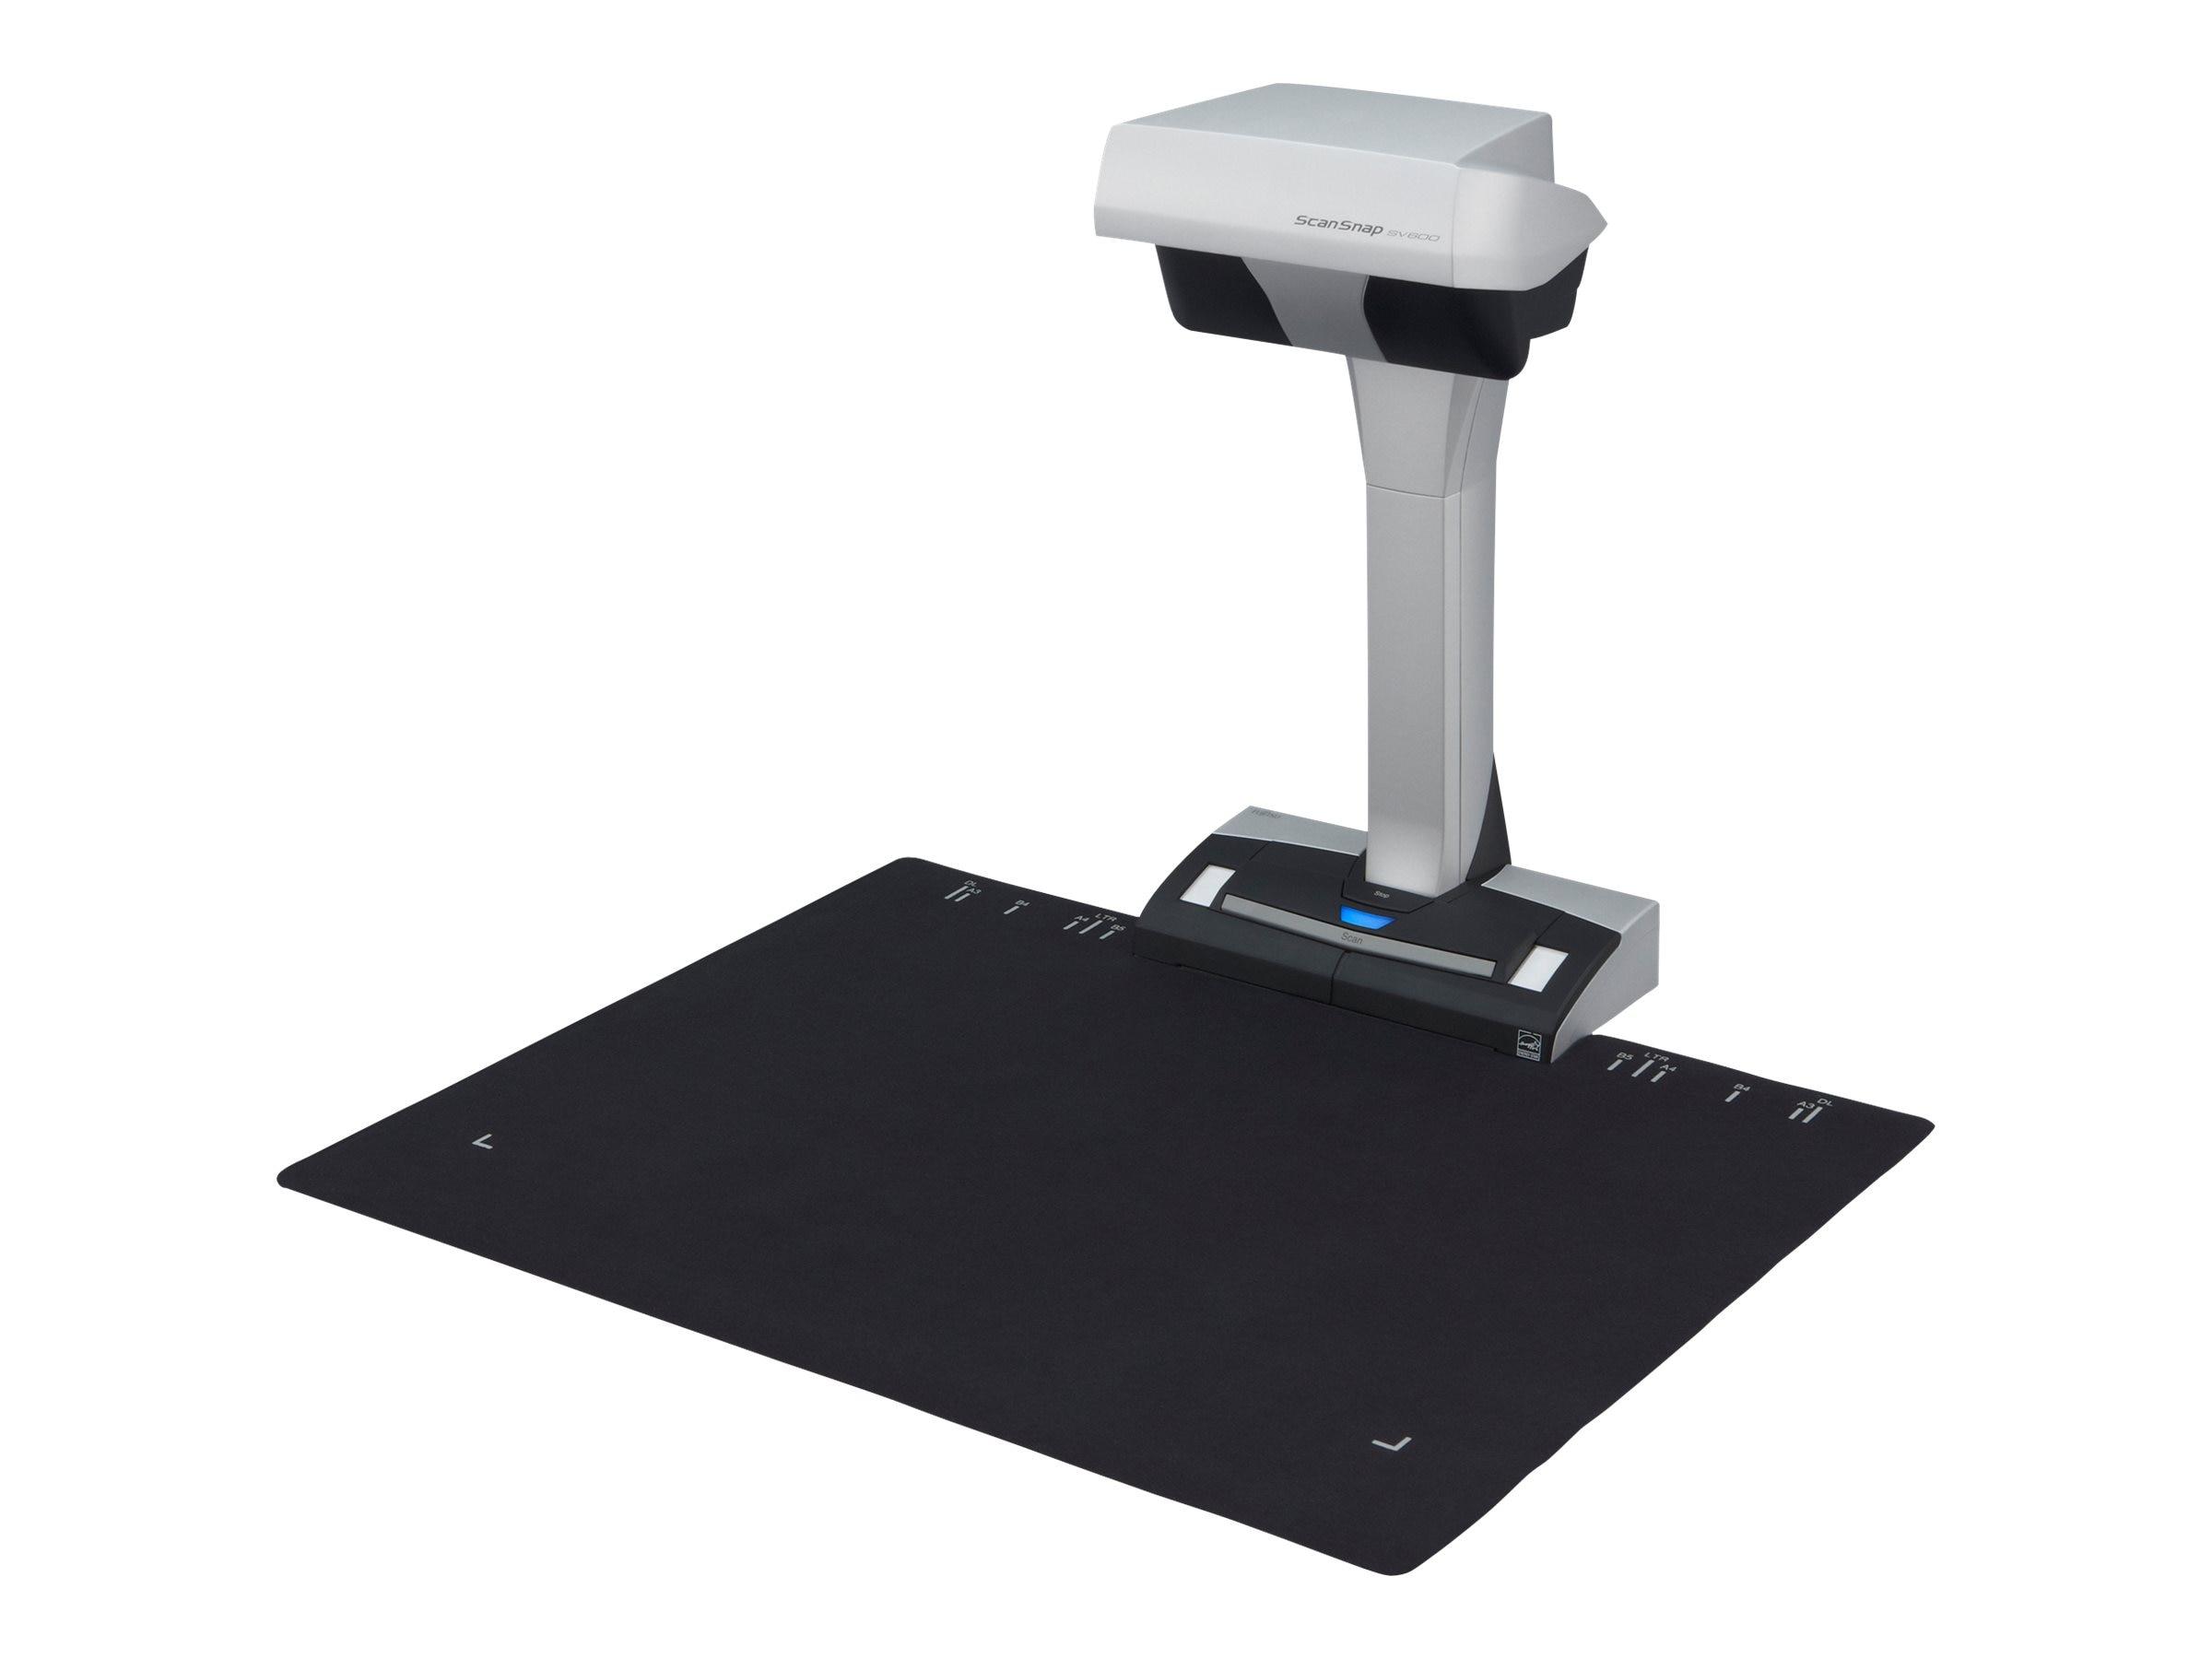 Fujitsu ScanSnap SV600 Overhead Scanner